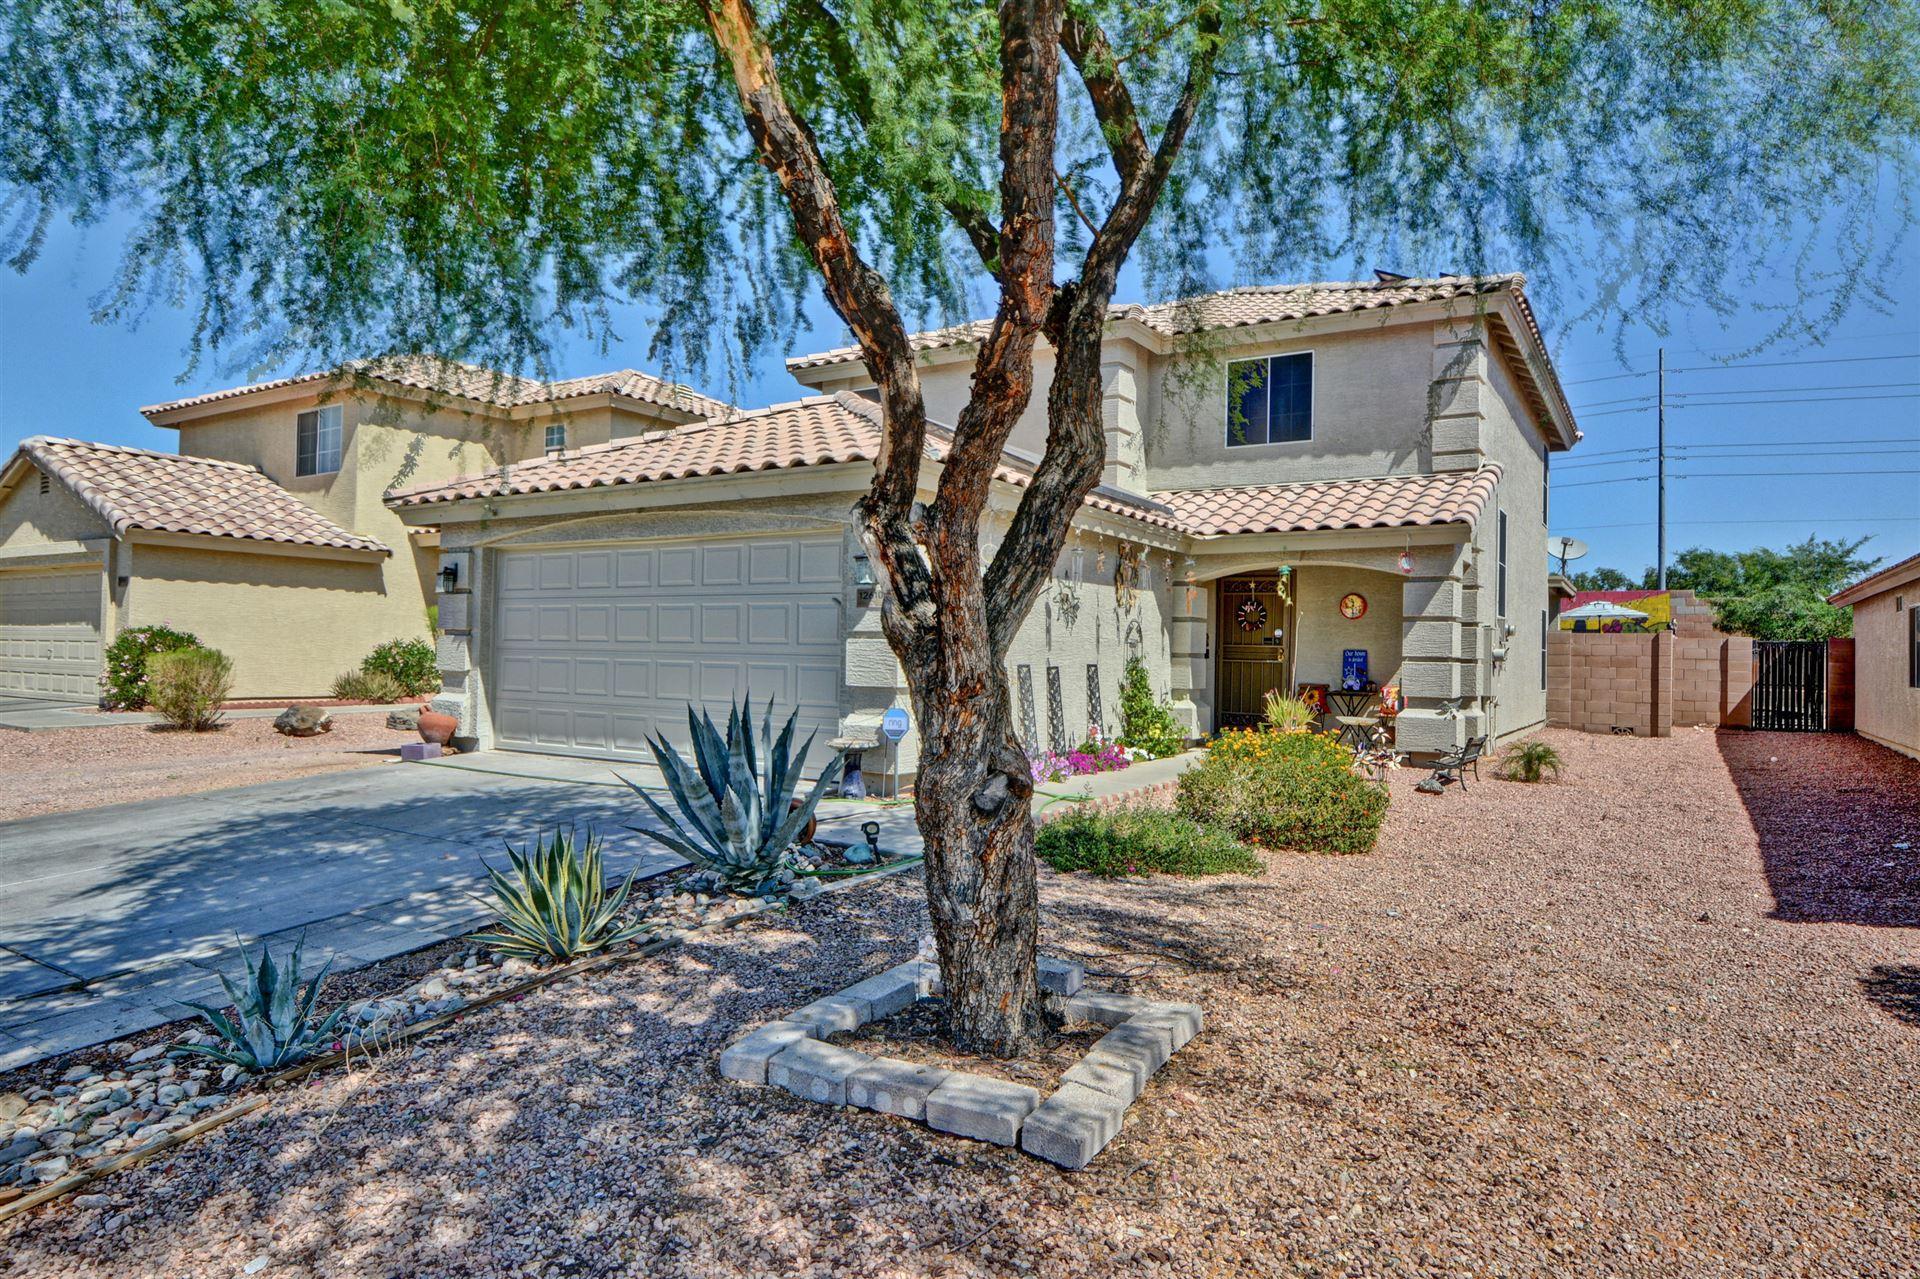 Photo of 12610 W SHAW BUTTE Drive, El Mirage, AZ 85335 (MLS # 6230822)